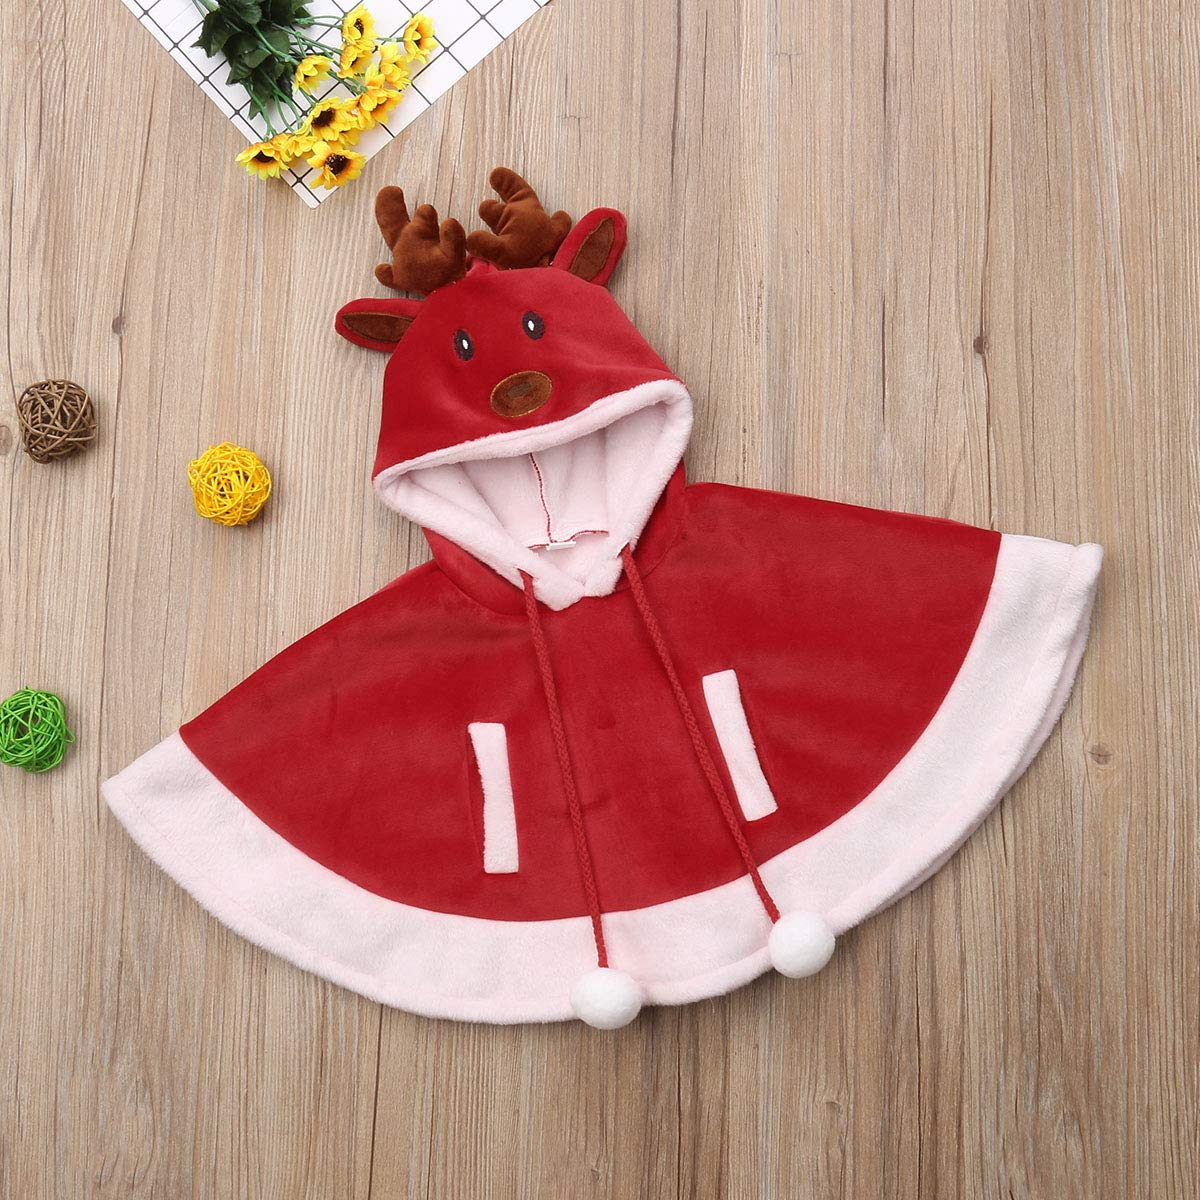 Red Riding Hood Girls Reindeer with Pompom Christmas Baby Girl Deer Hood Cape